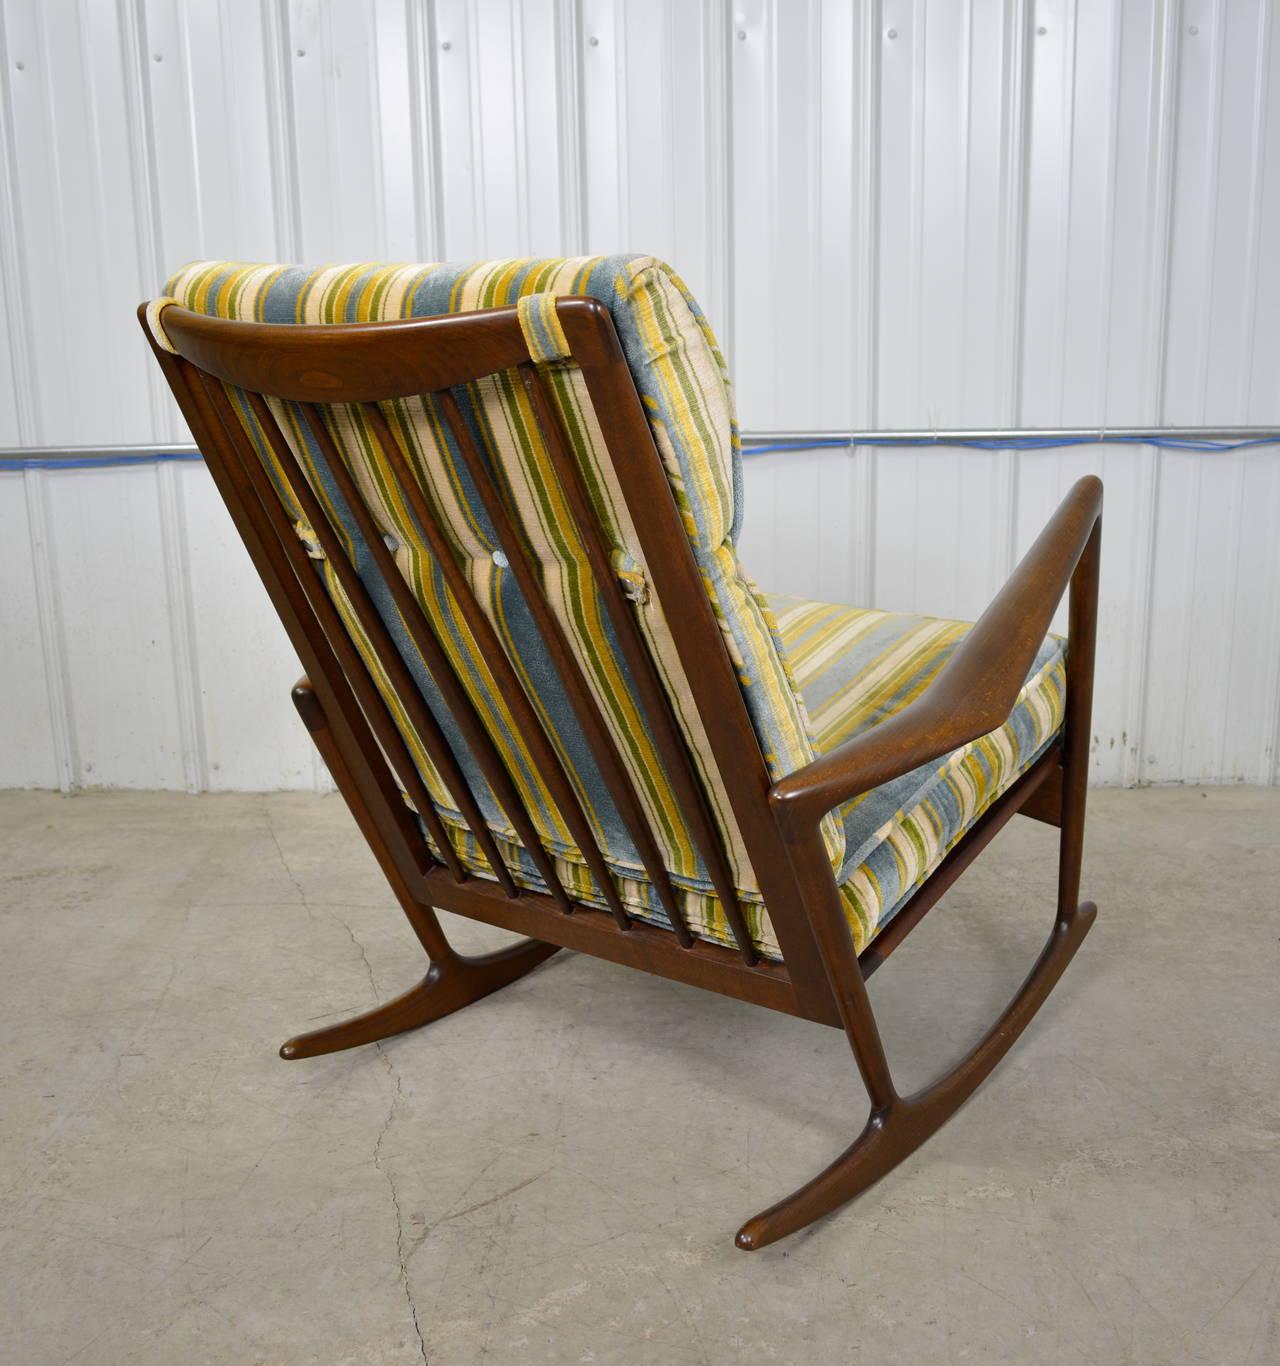 danish modern rocking chair paris cafe table and chairs ib kofod larsen at 1stdibs